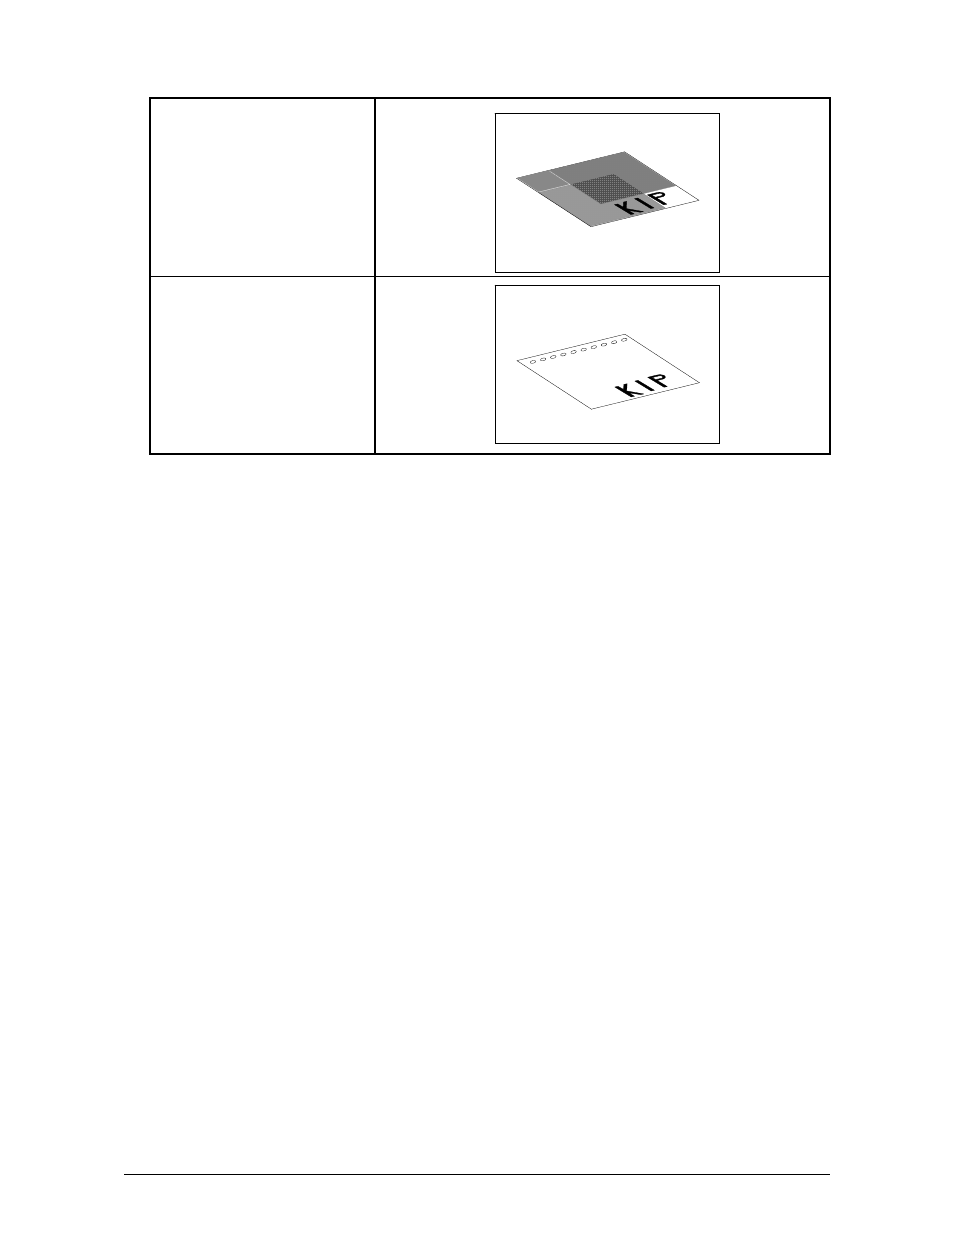 konica minolta kip 3100 user manual page 17 56 rh manualsdir com